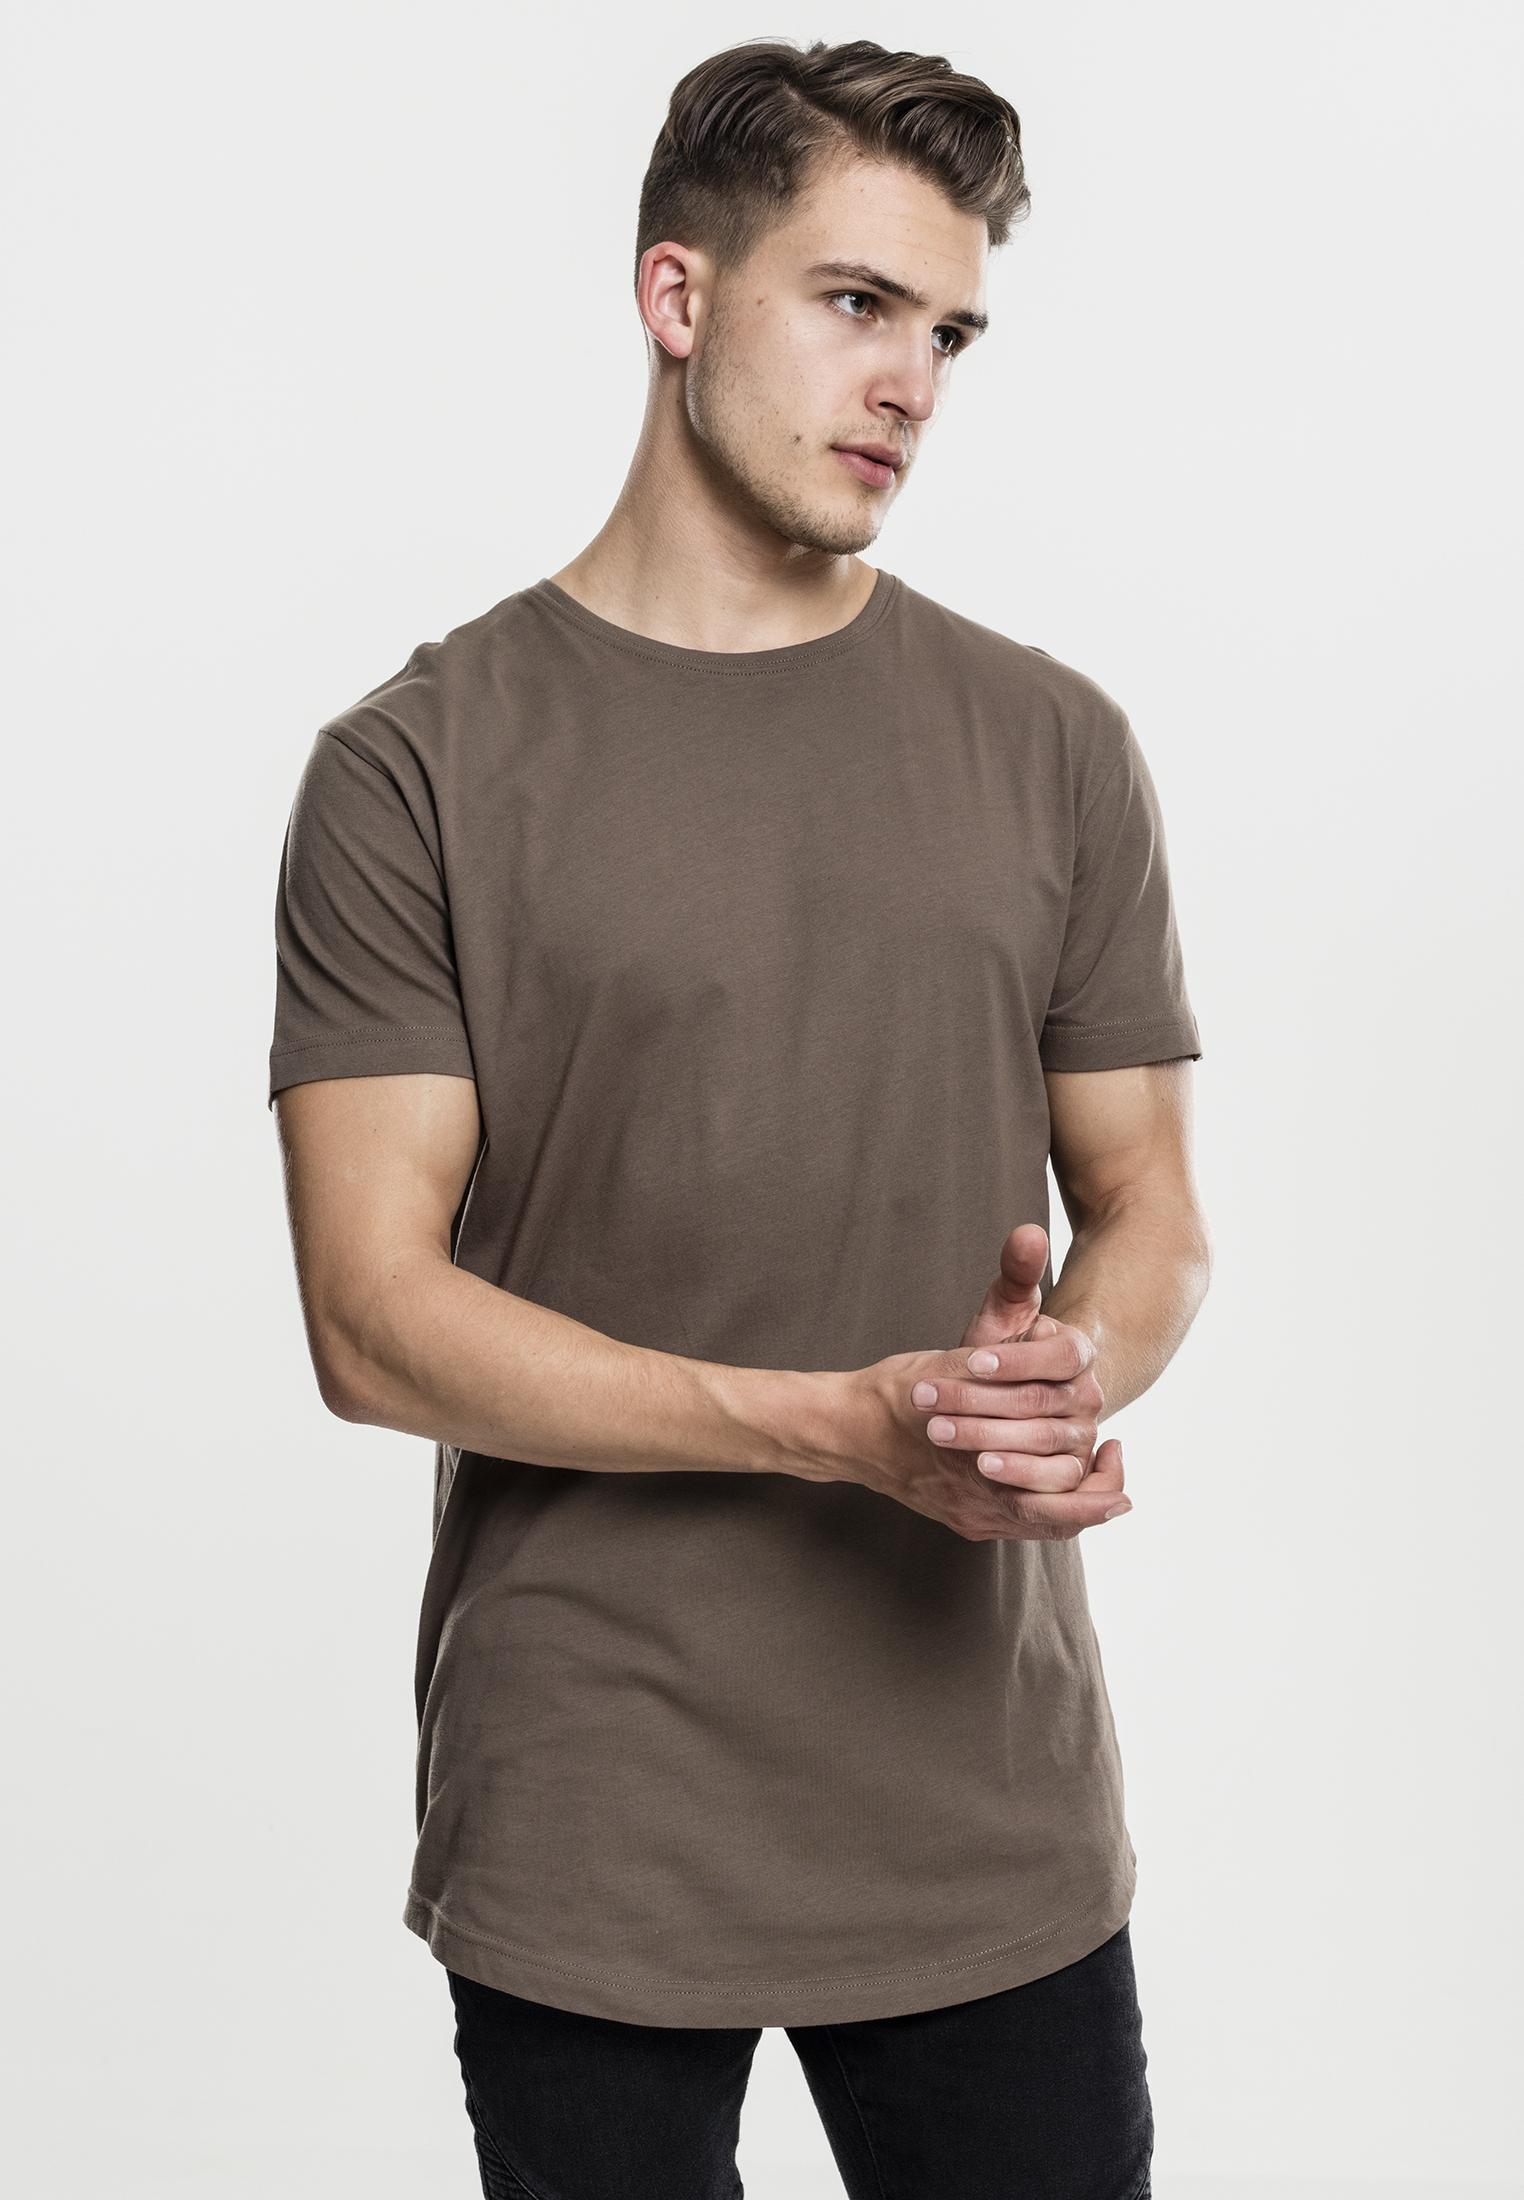 81e058ca6c3b Urban Classics Herren T-Shirt extra lang long Shirt shaped TB638 ...